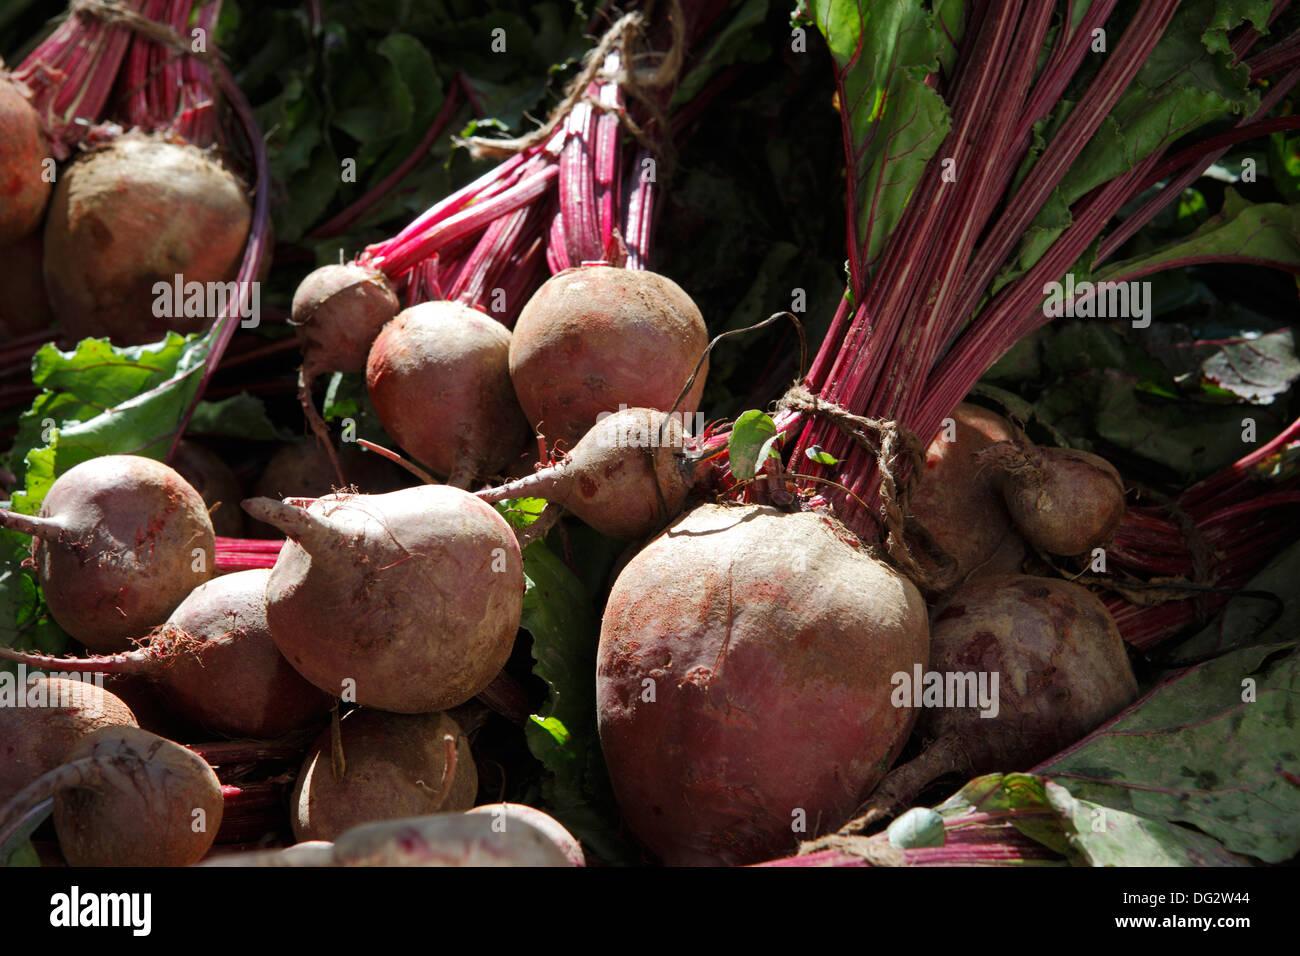 red turnip - Stock Image